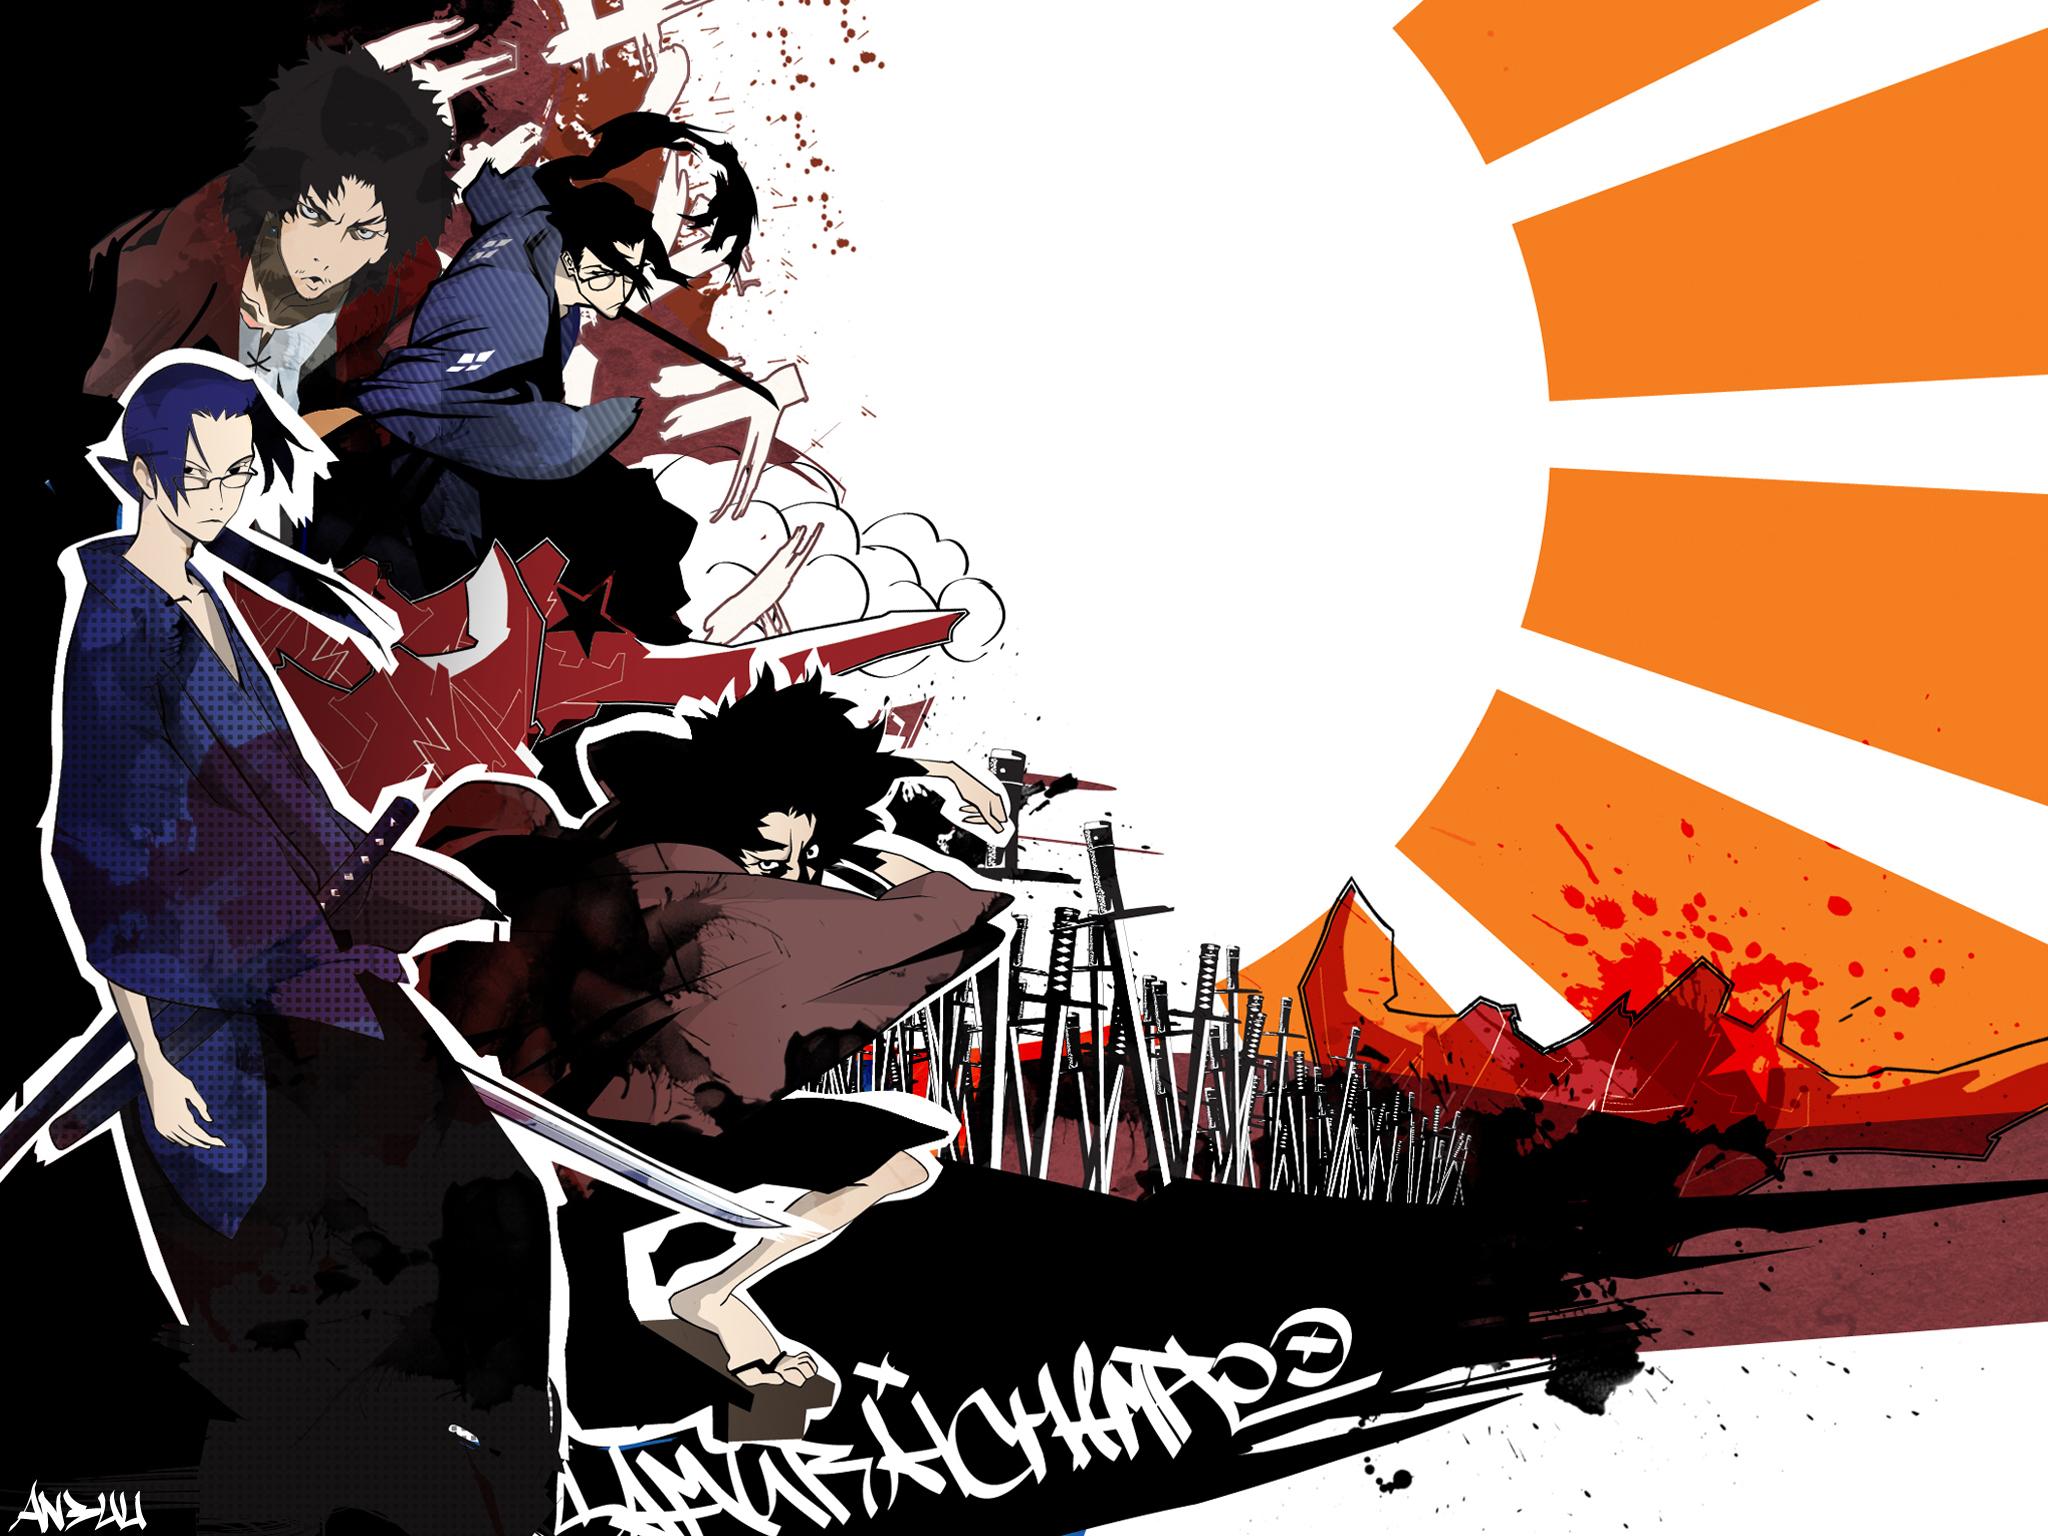 Samurai Champloo HD Wallpaper Background Image 2048x1536 ID 2048x1536